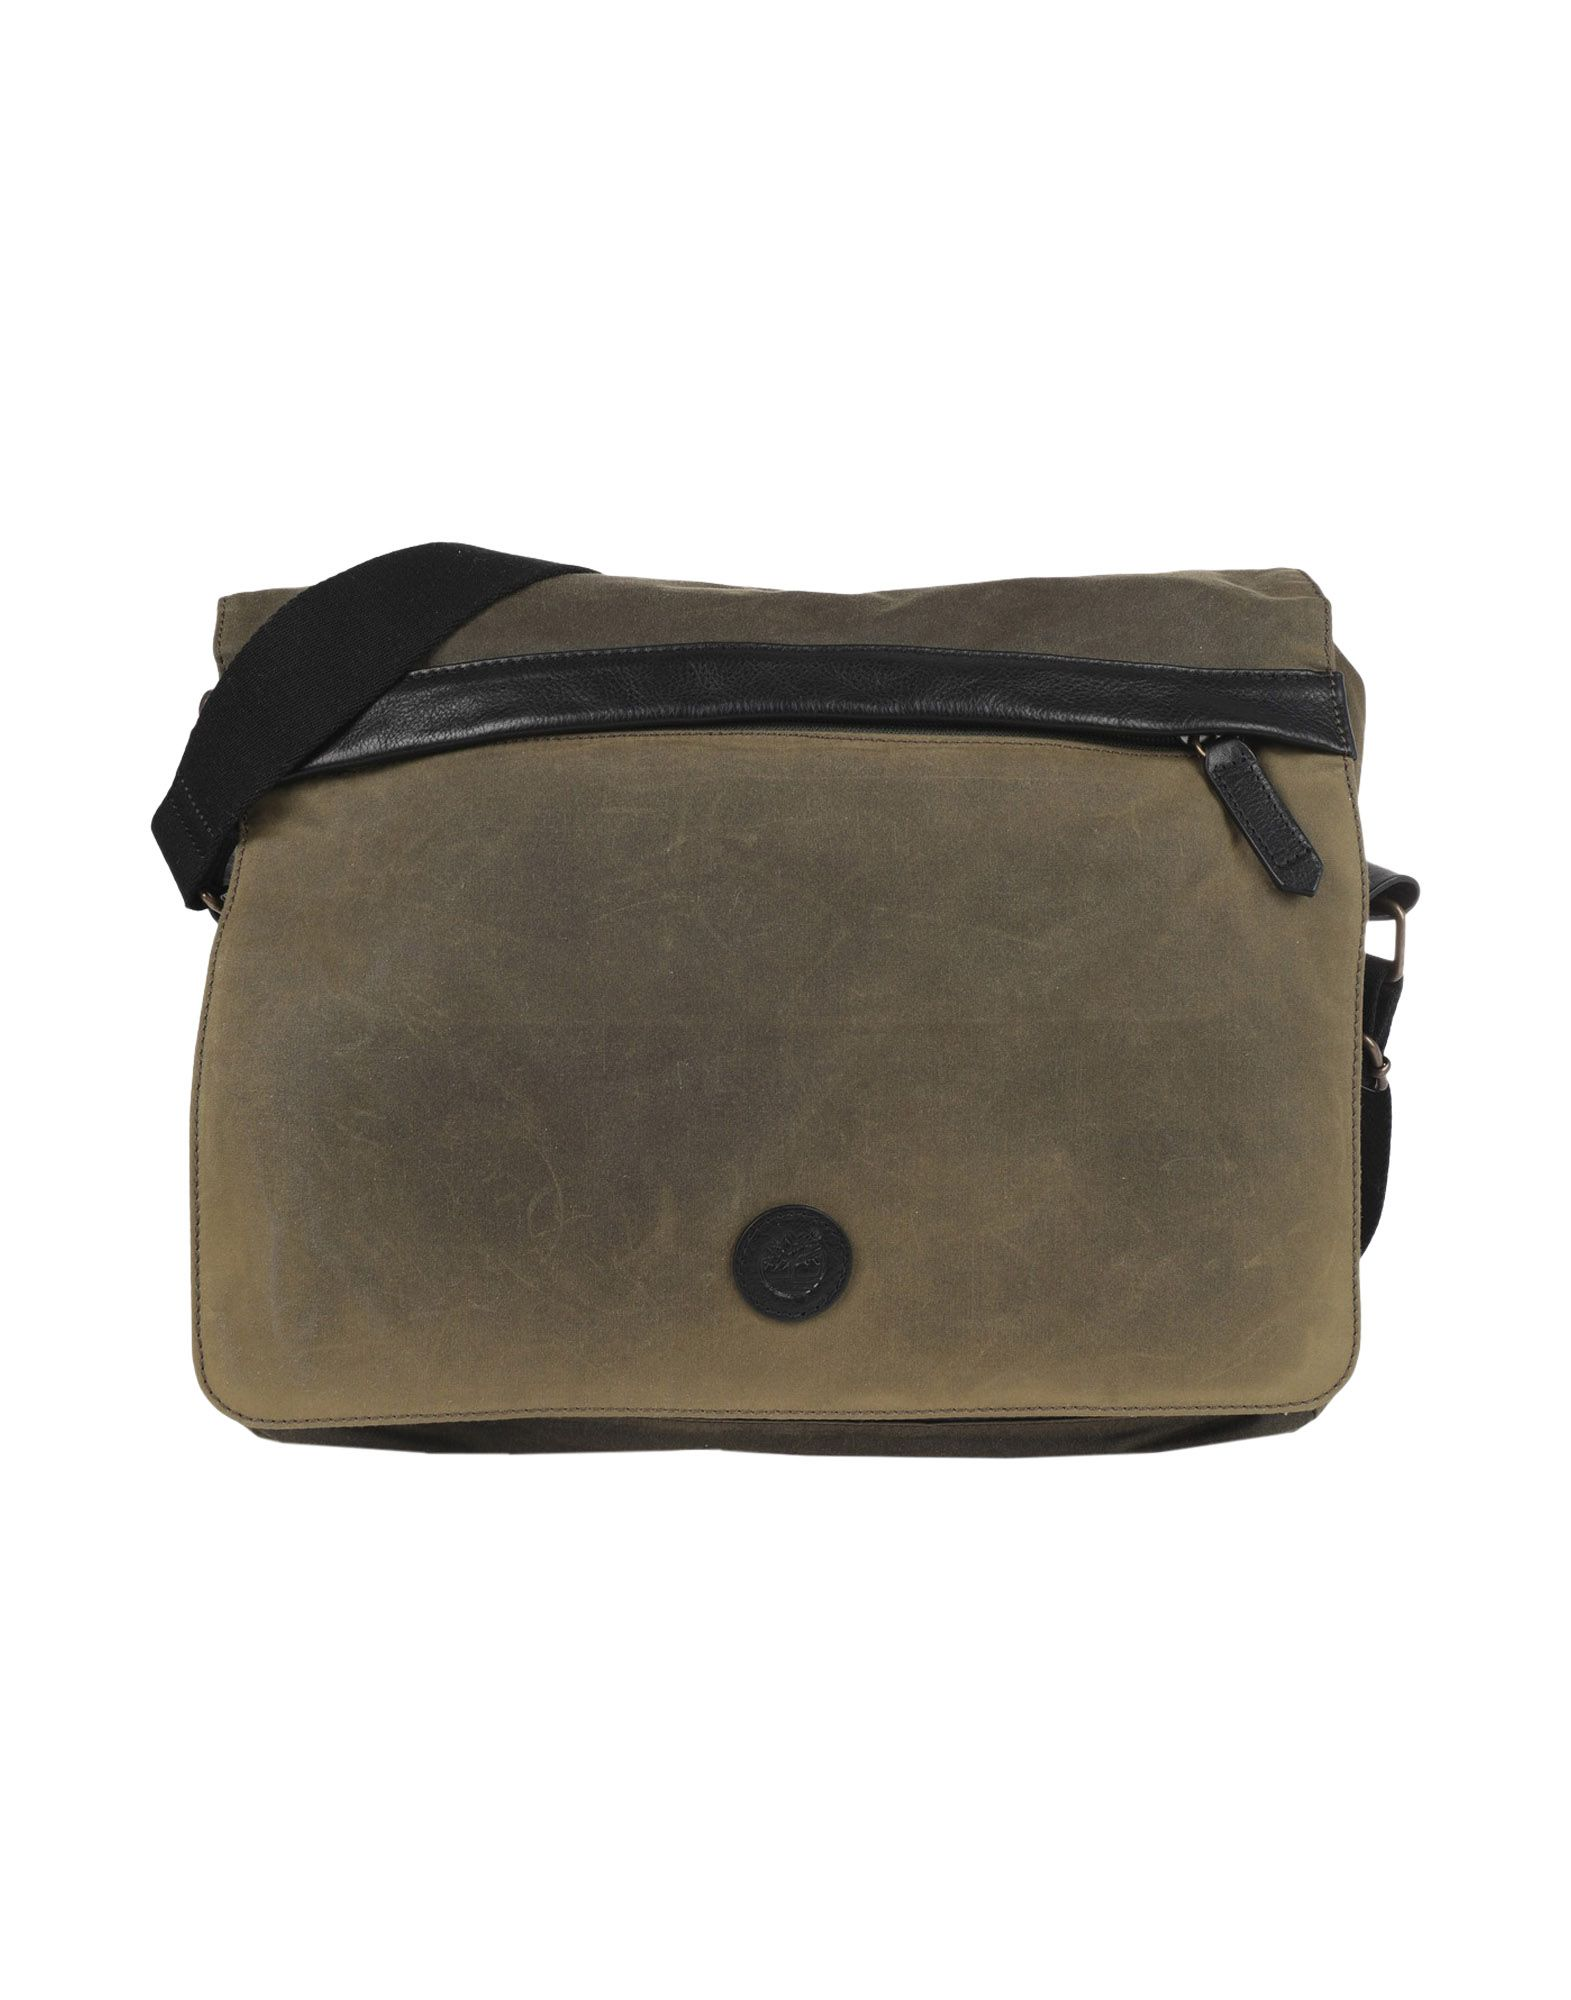 TIMBERLAND Деловые сумки сумка marina creazioni сумки деловые